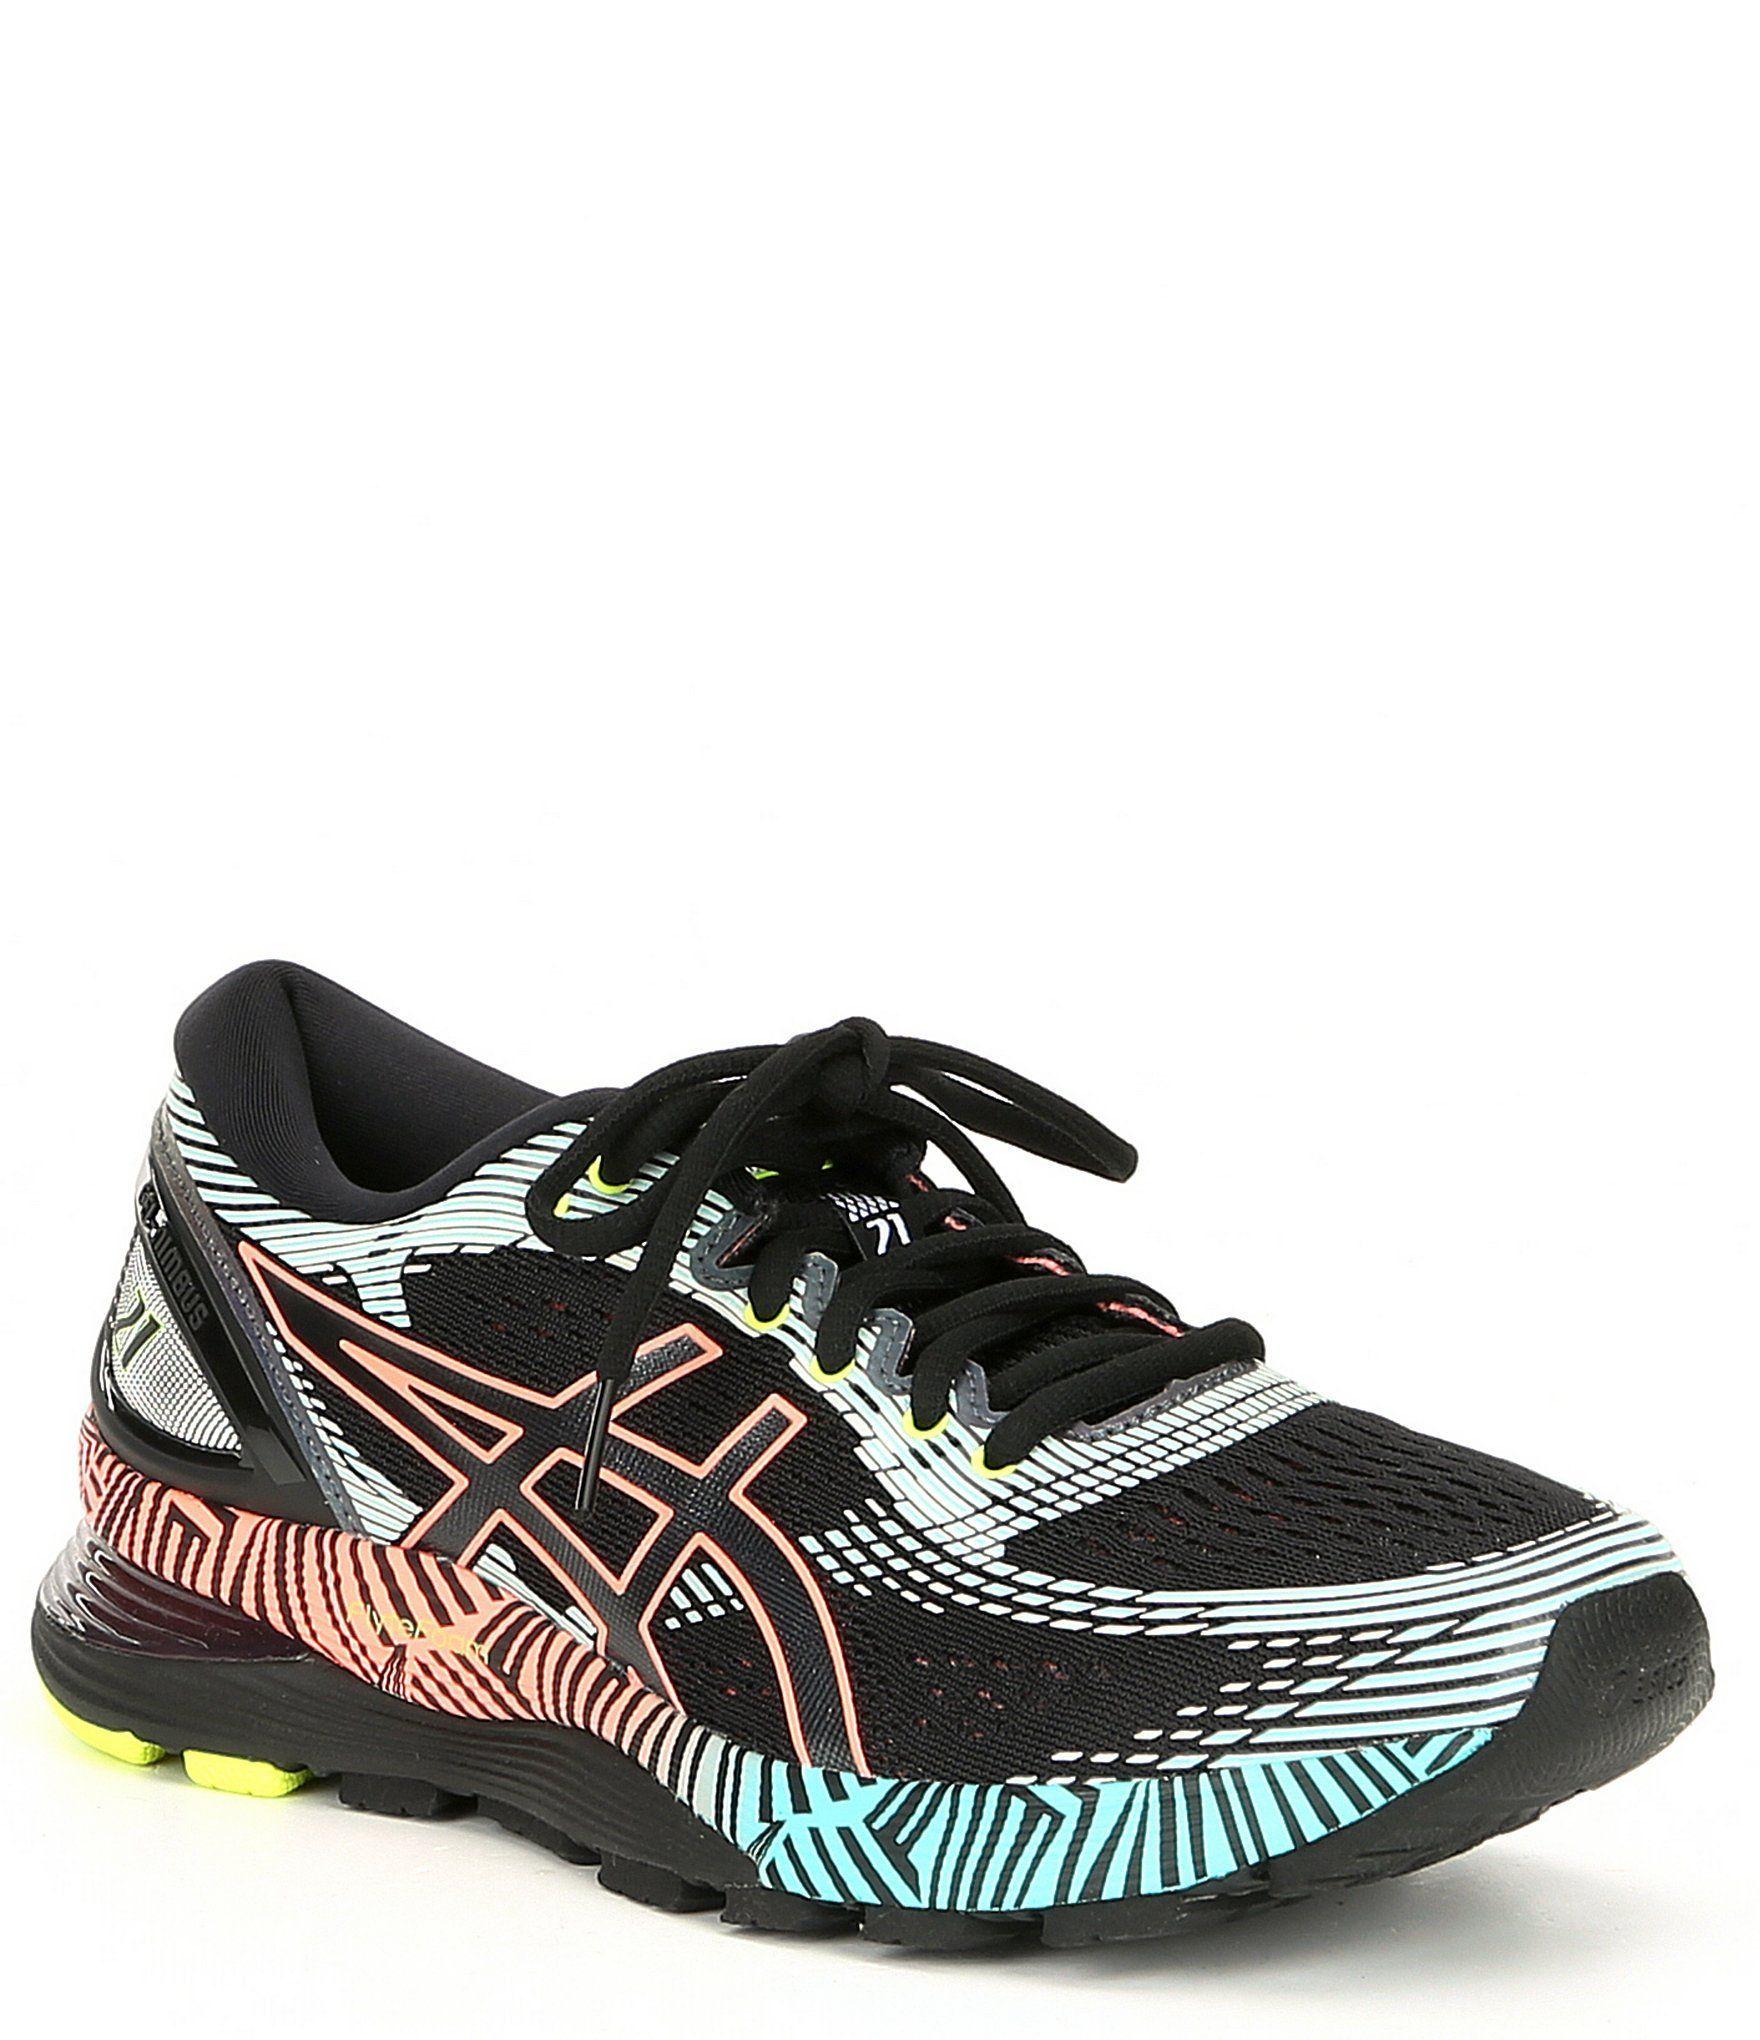 ASICS Women's GEL-Nimbus 21 Lite-Show Running Shoe ...